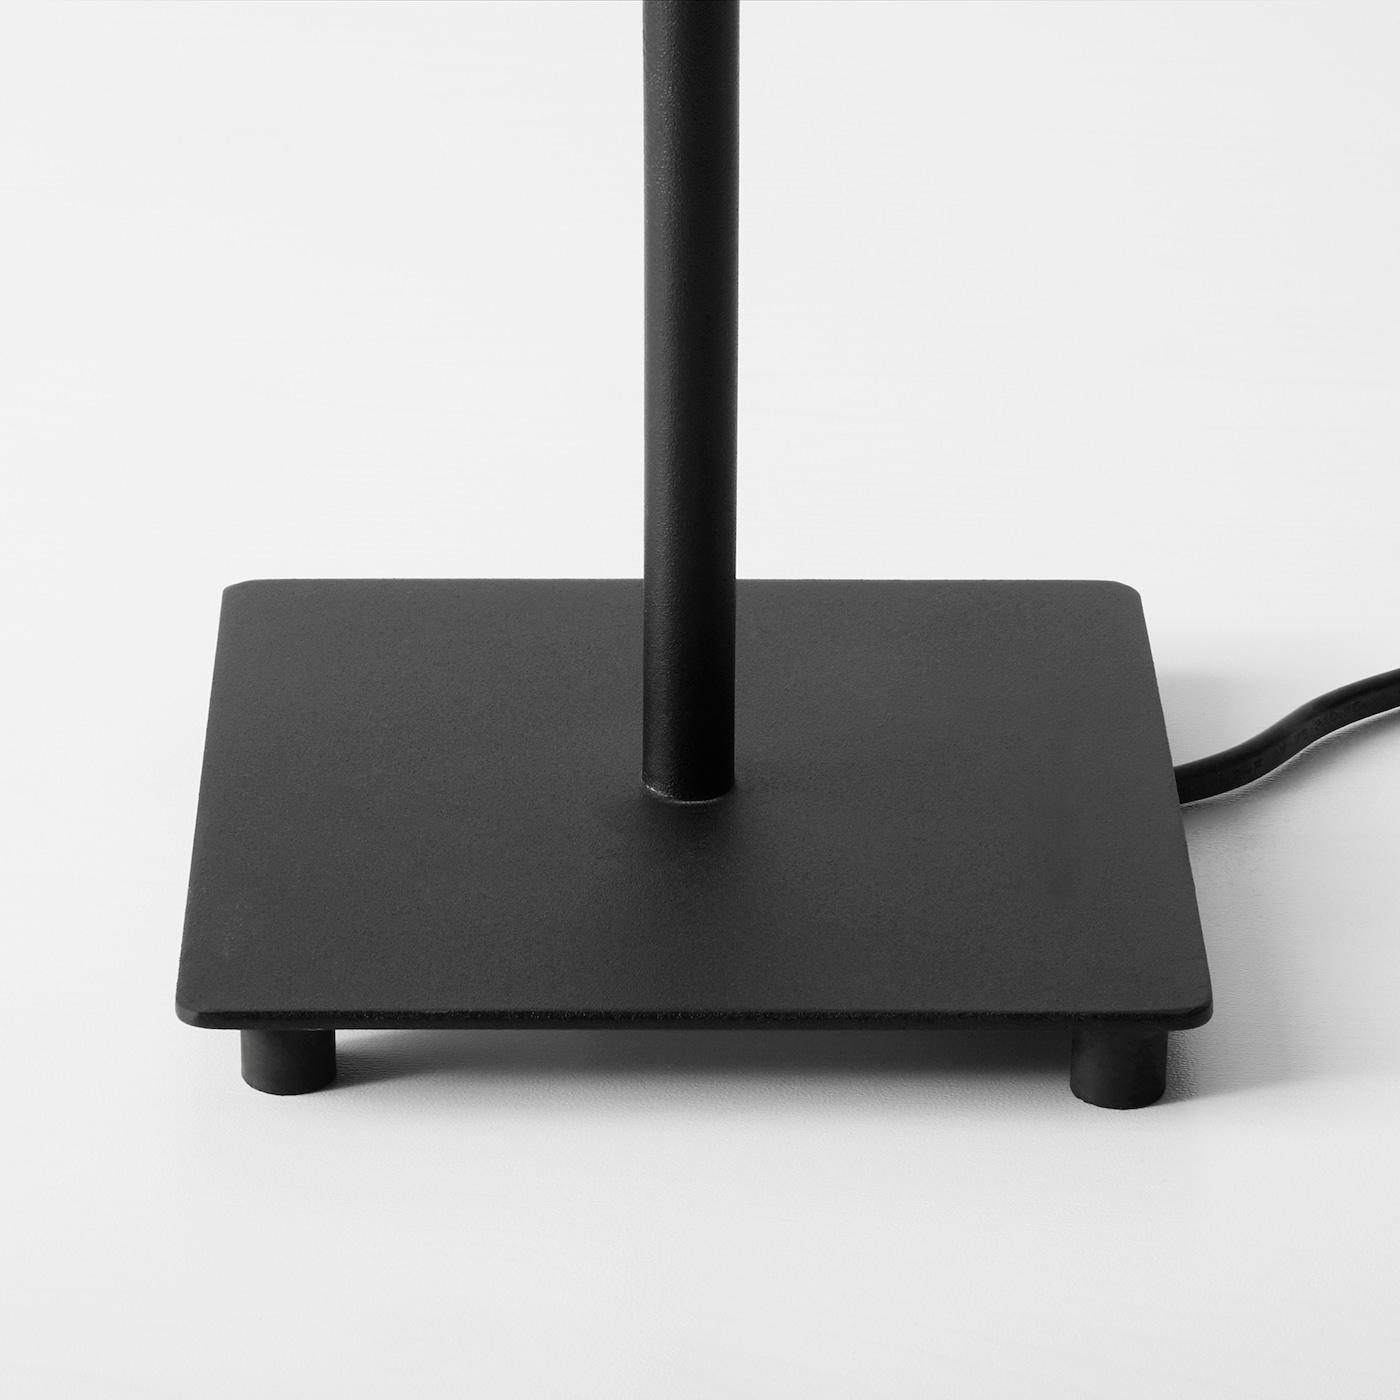 HEMMA Bordslampfot svart 35 cm